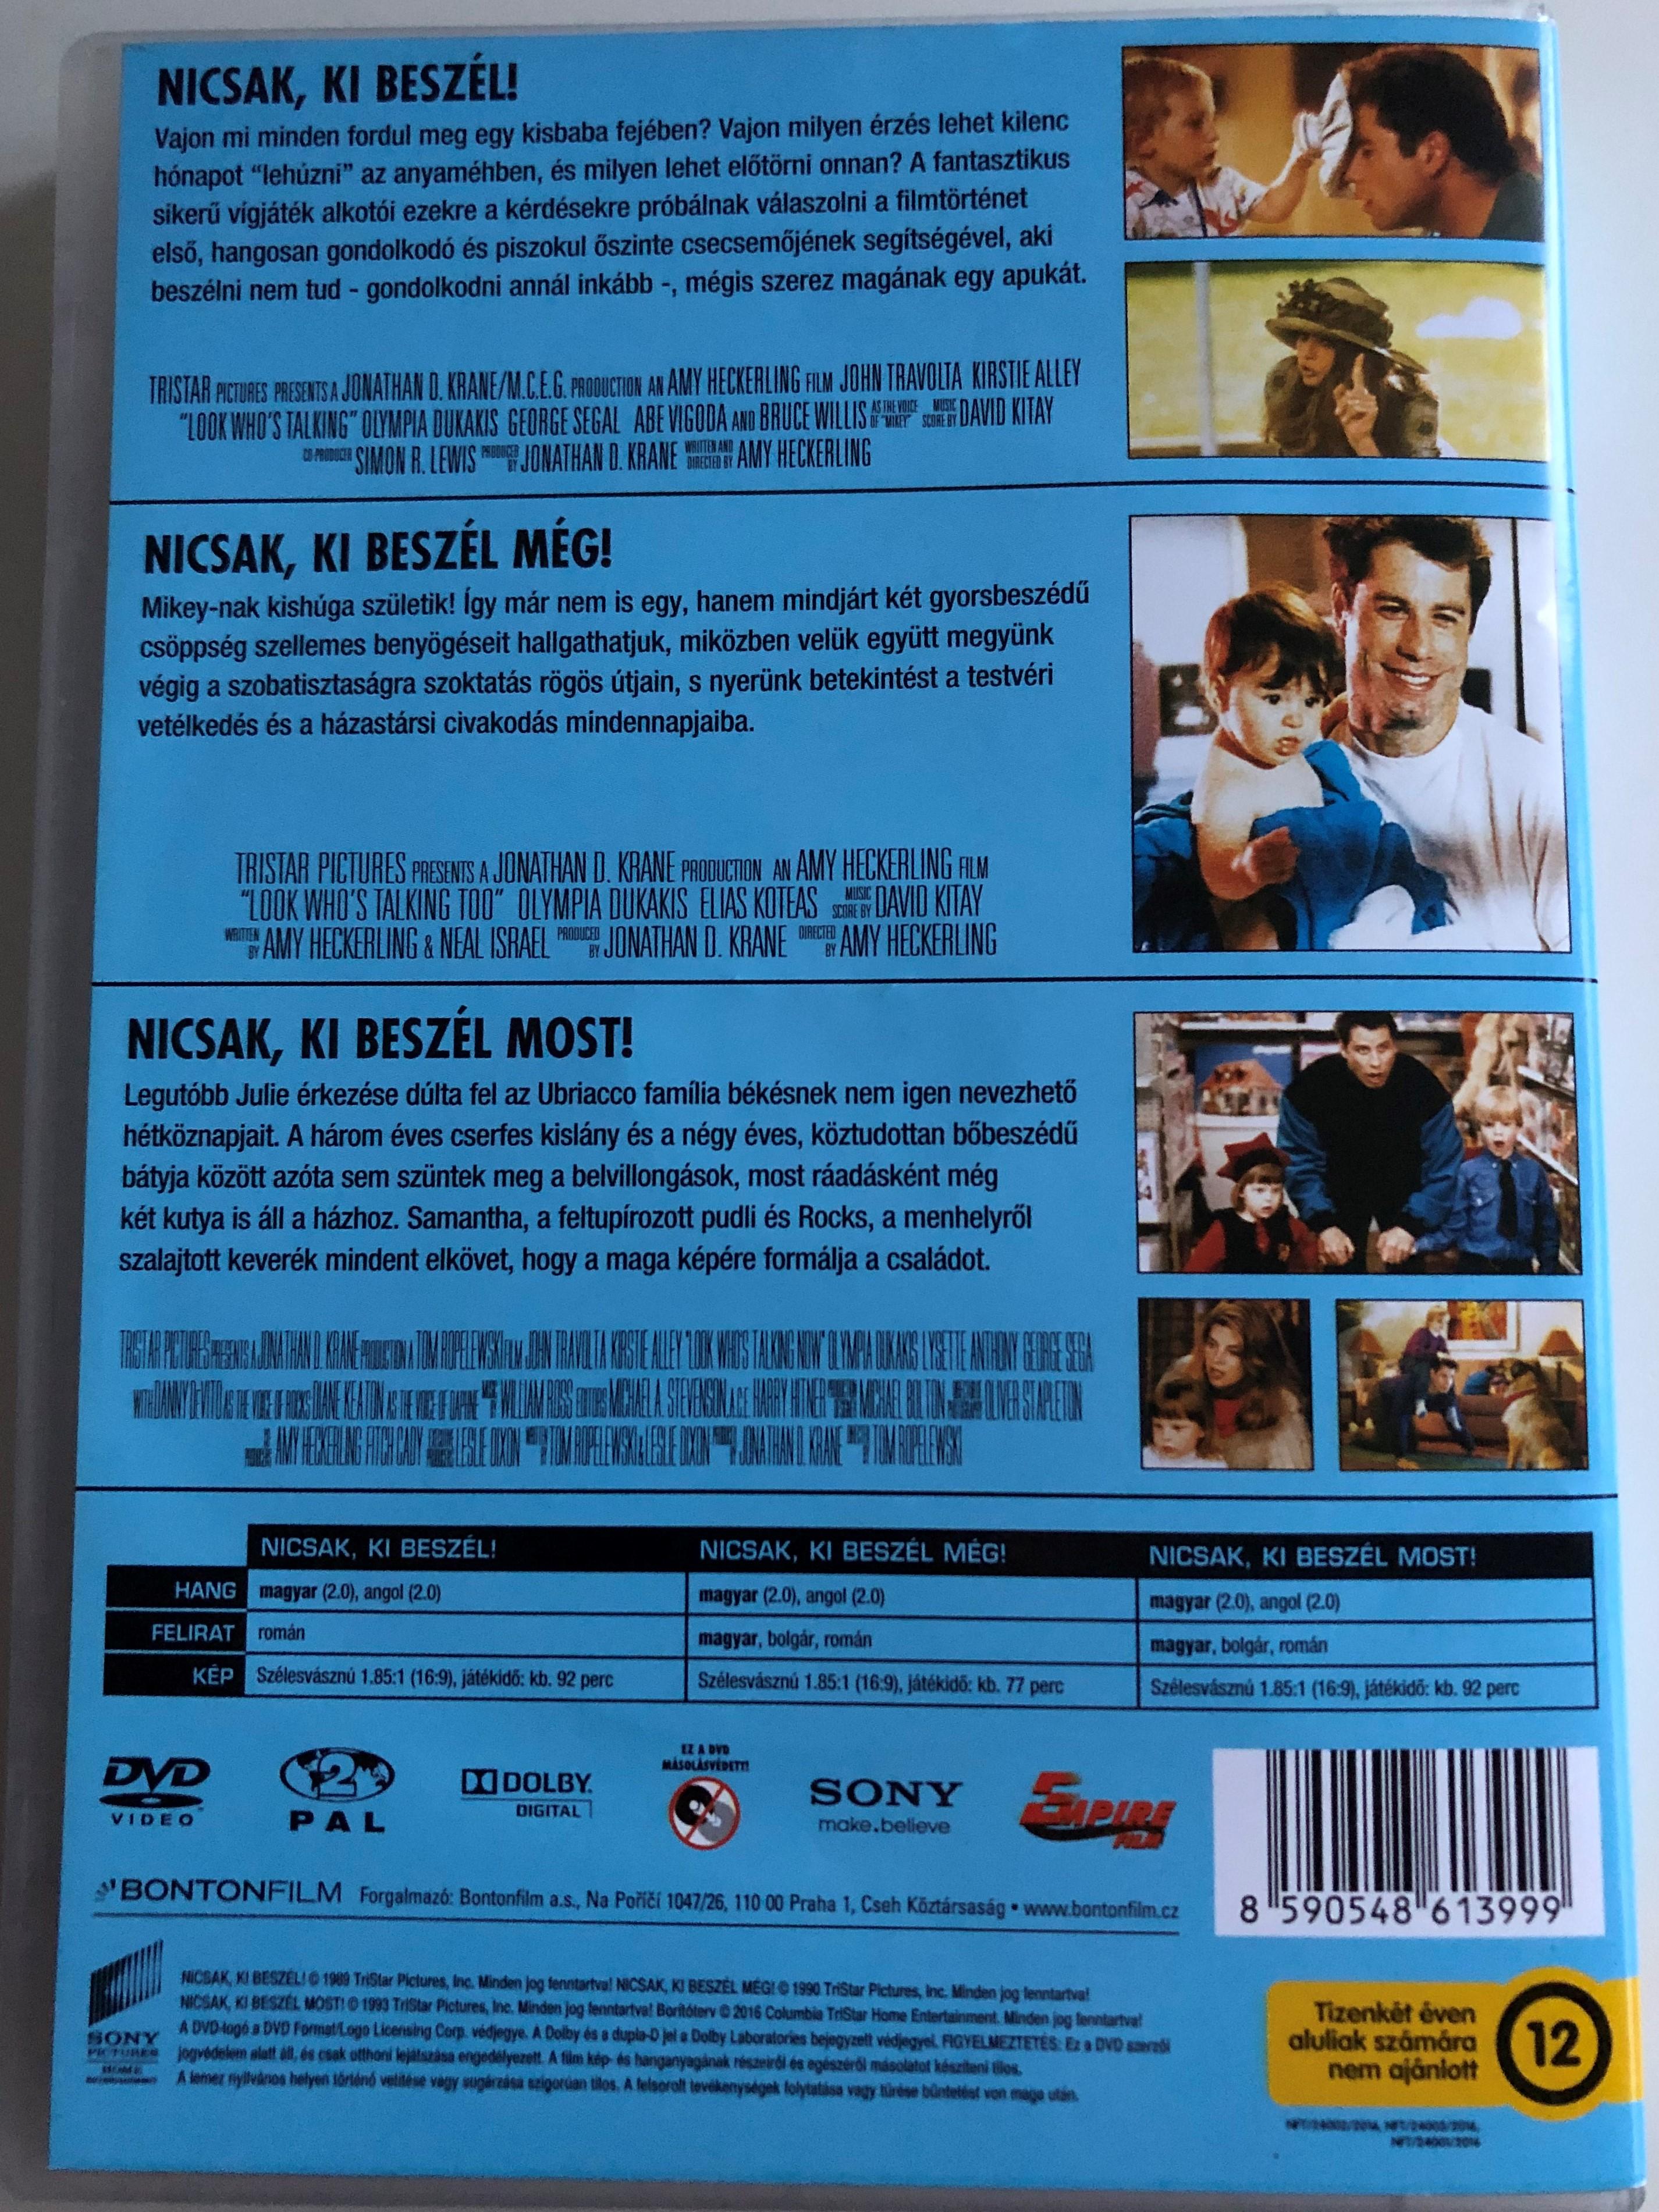 look-who-s-talking-dvd-set-nicsak-ki-besz-l-look-who-s-talking-too-look-who-s-talking-now-4.jpg